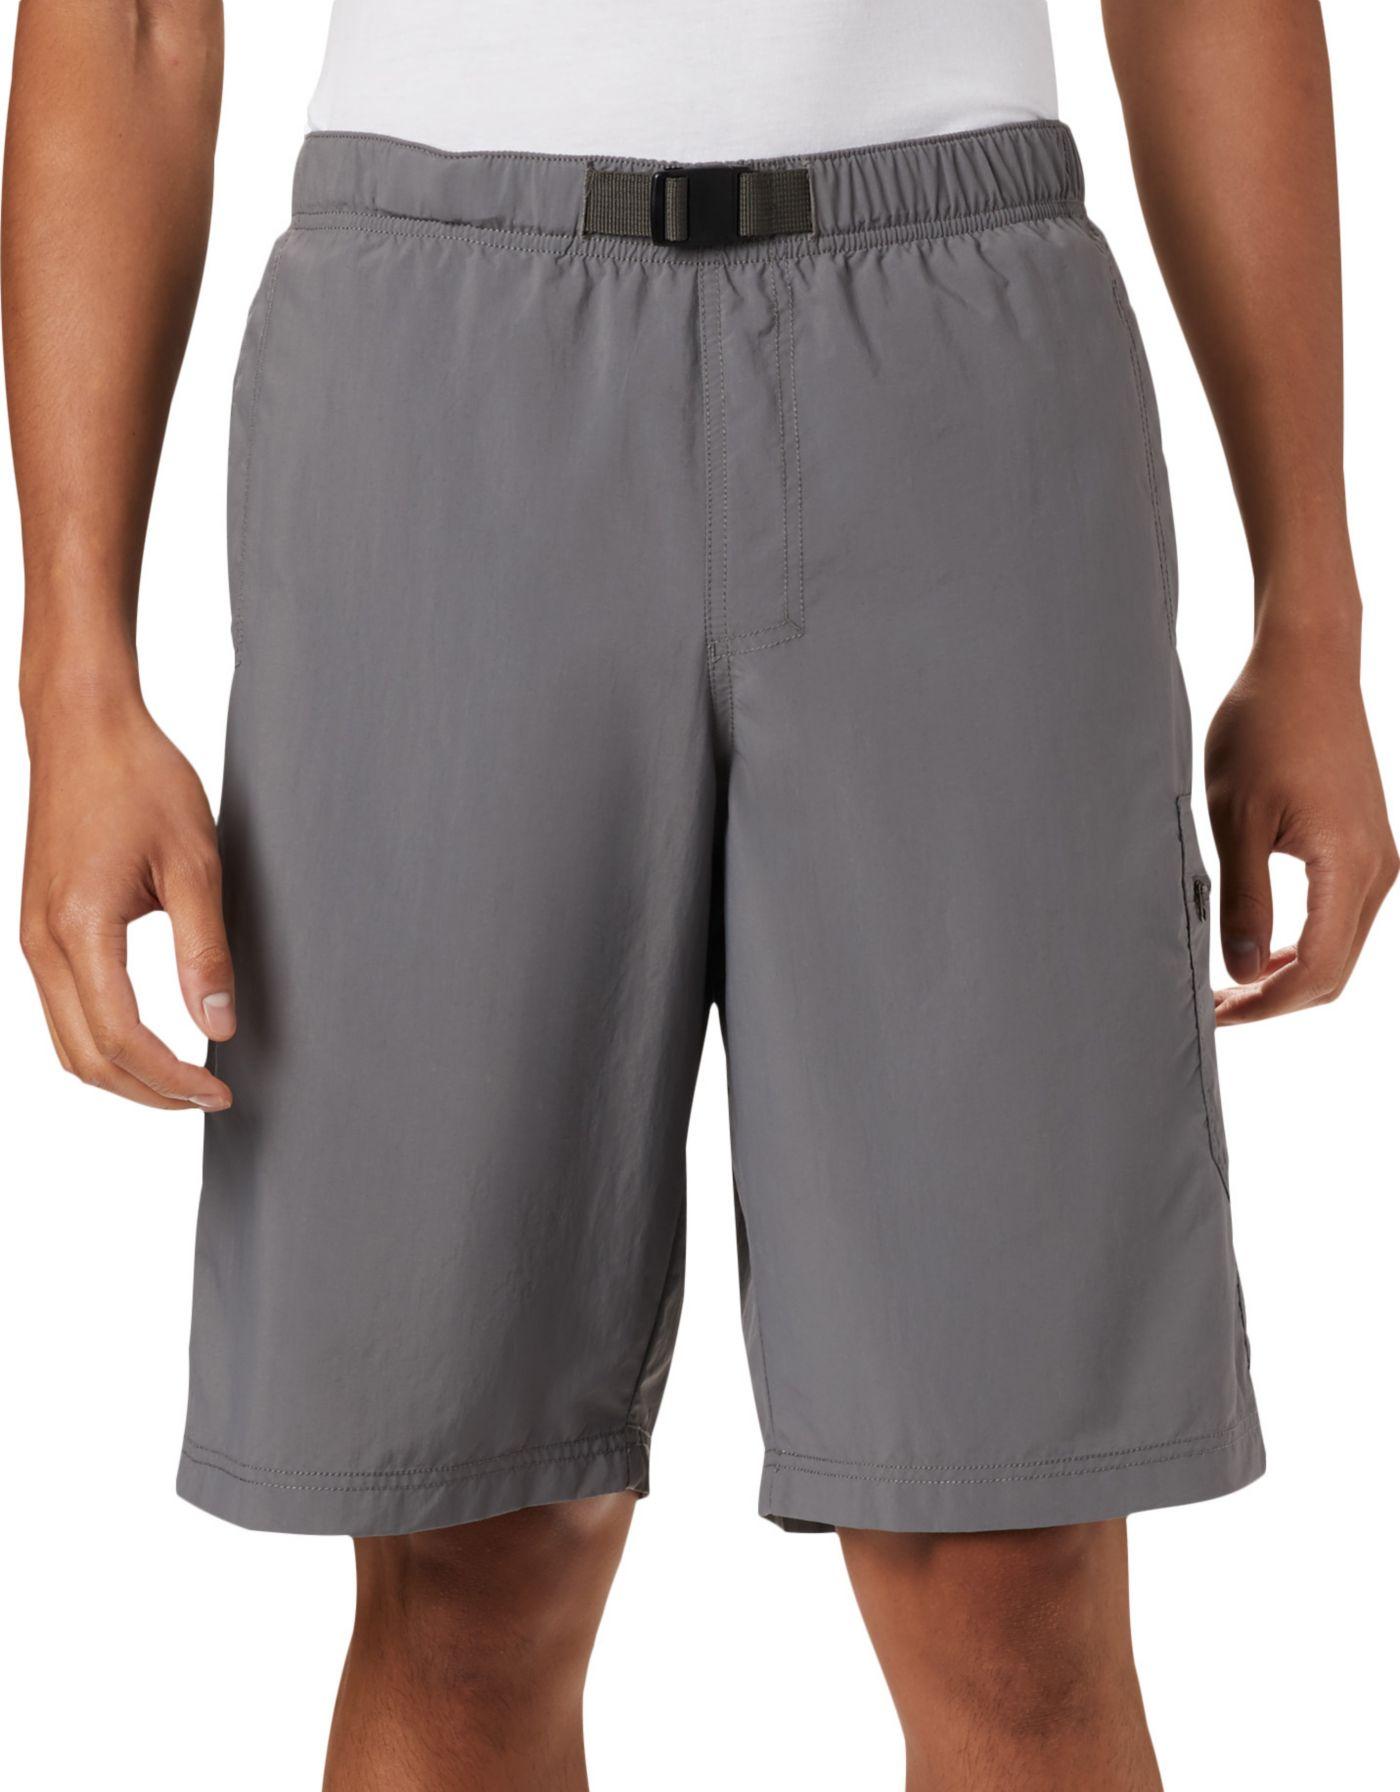 Columbia Men's Palmerston Peak Shorts